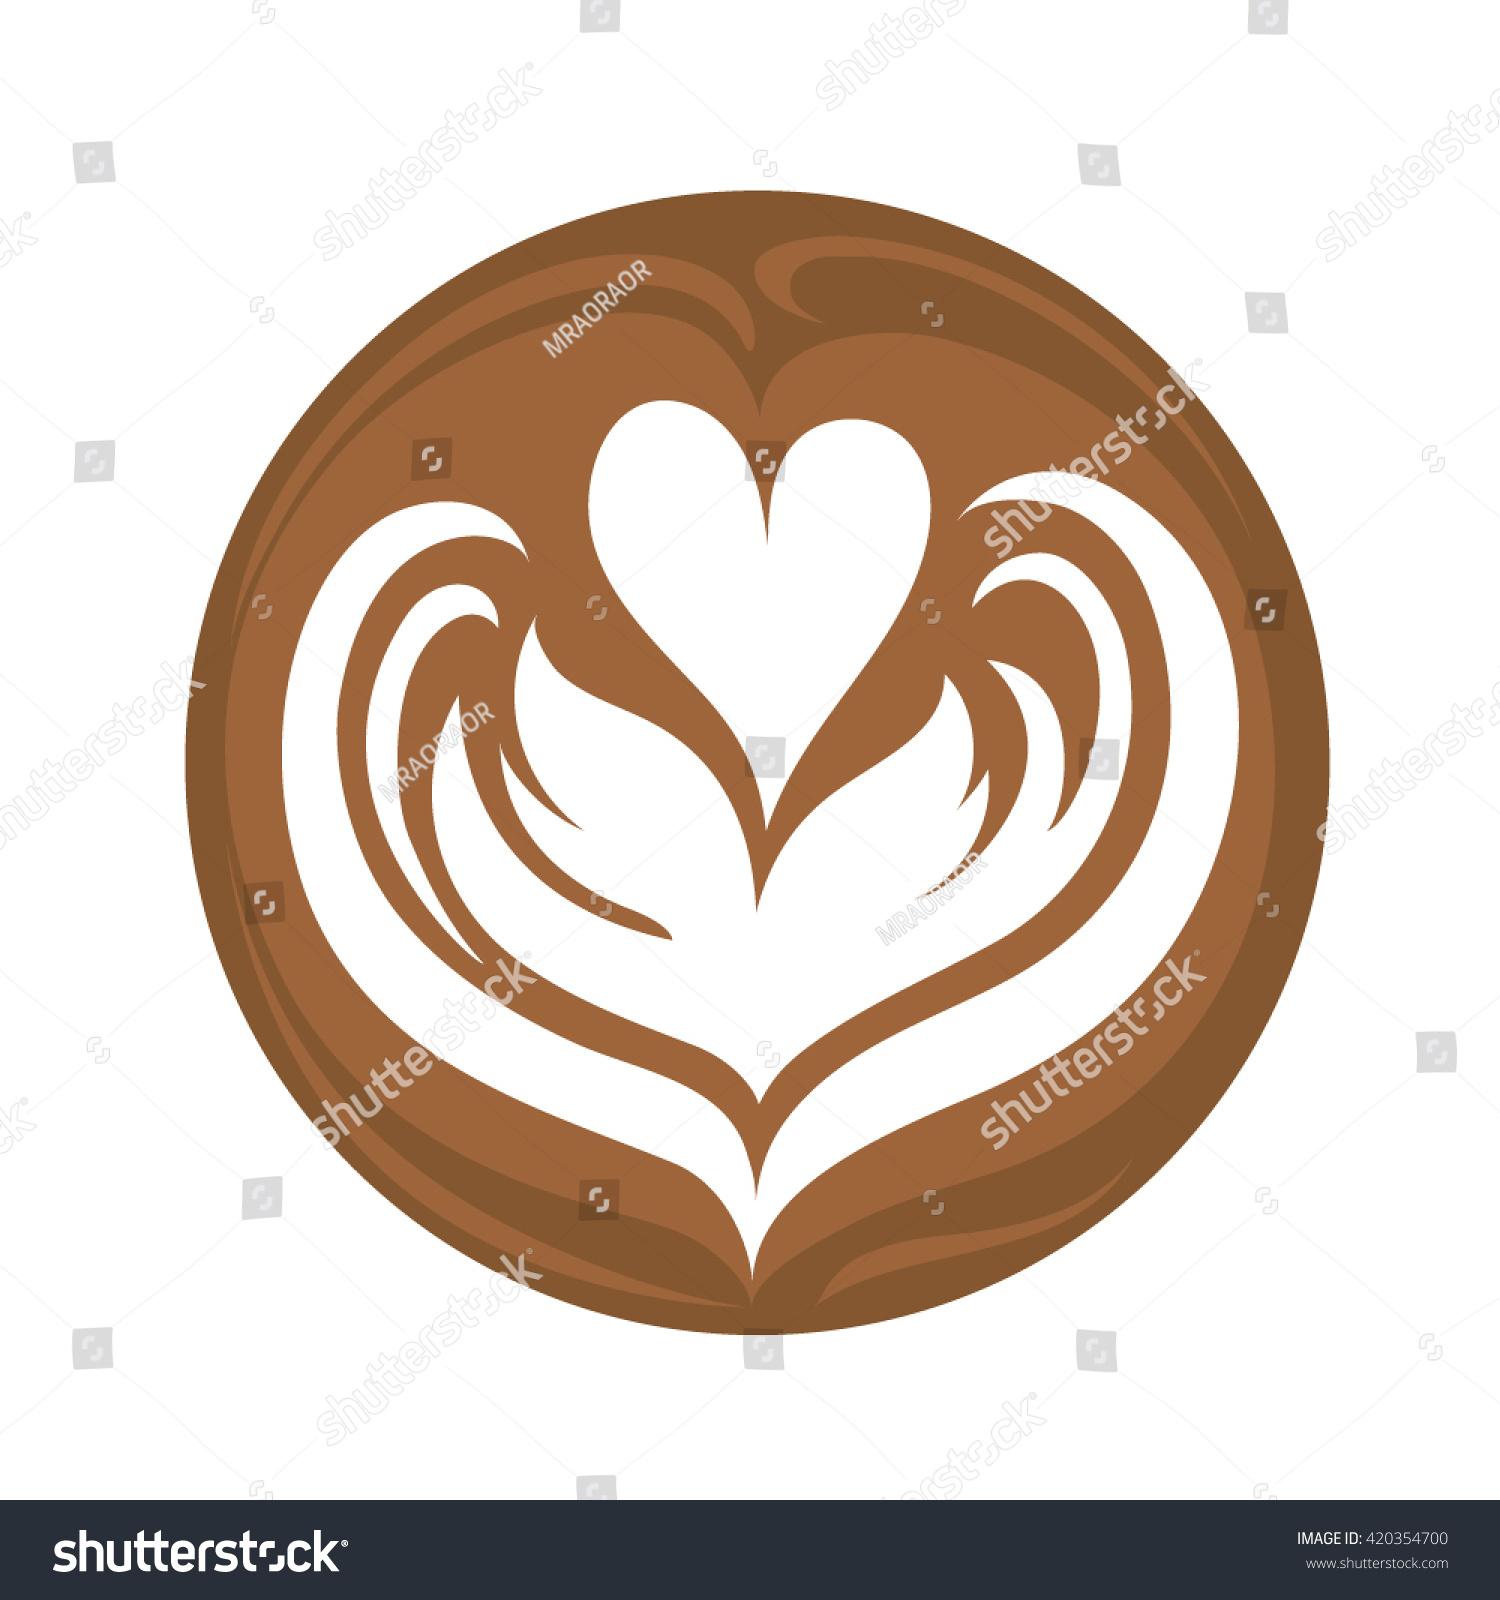 Tulip heart coffee latte art logo 420354700 tulip heart coffee latte art logo 420354700 shutterstock voltagebd Image collections